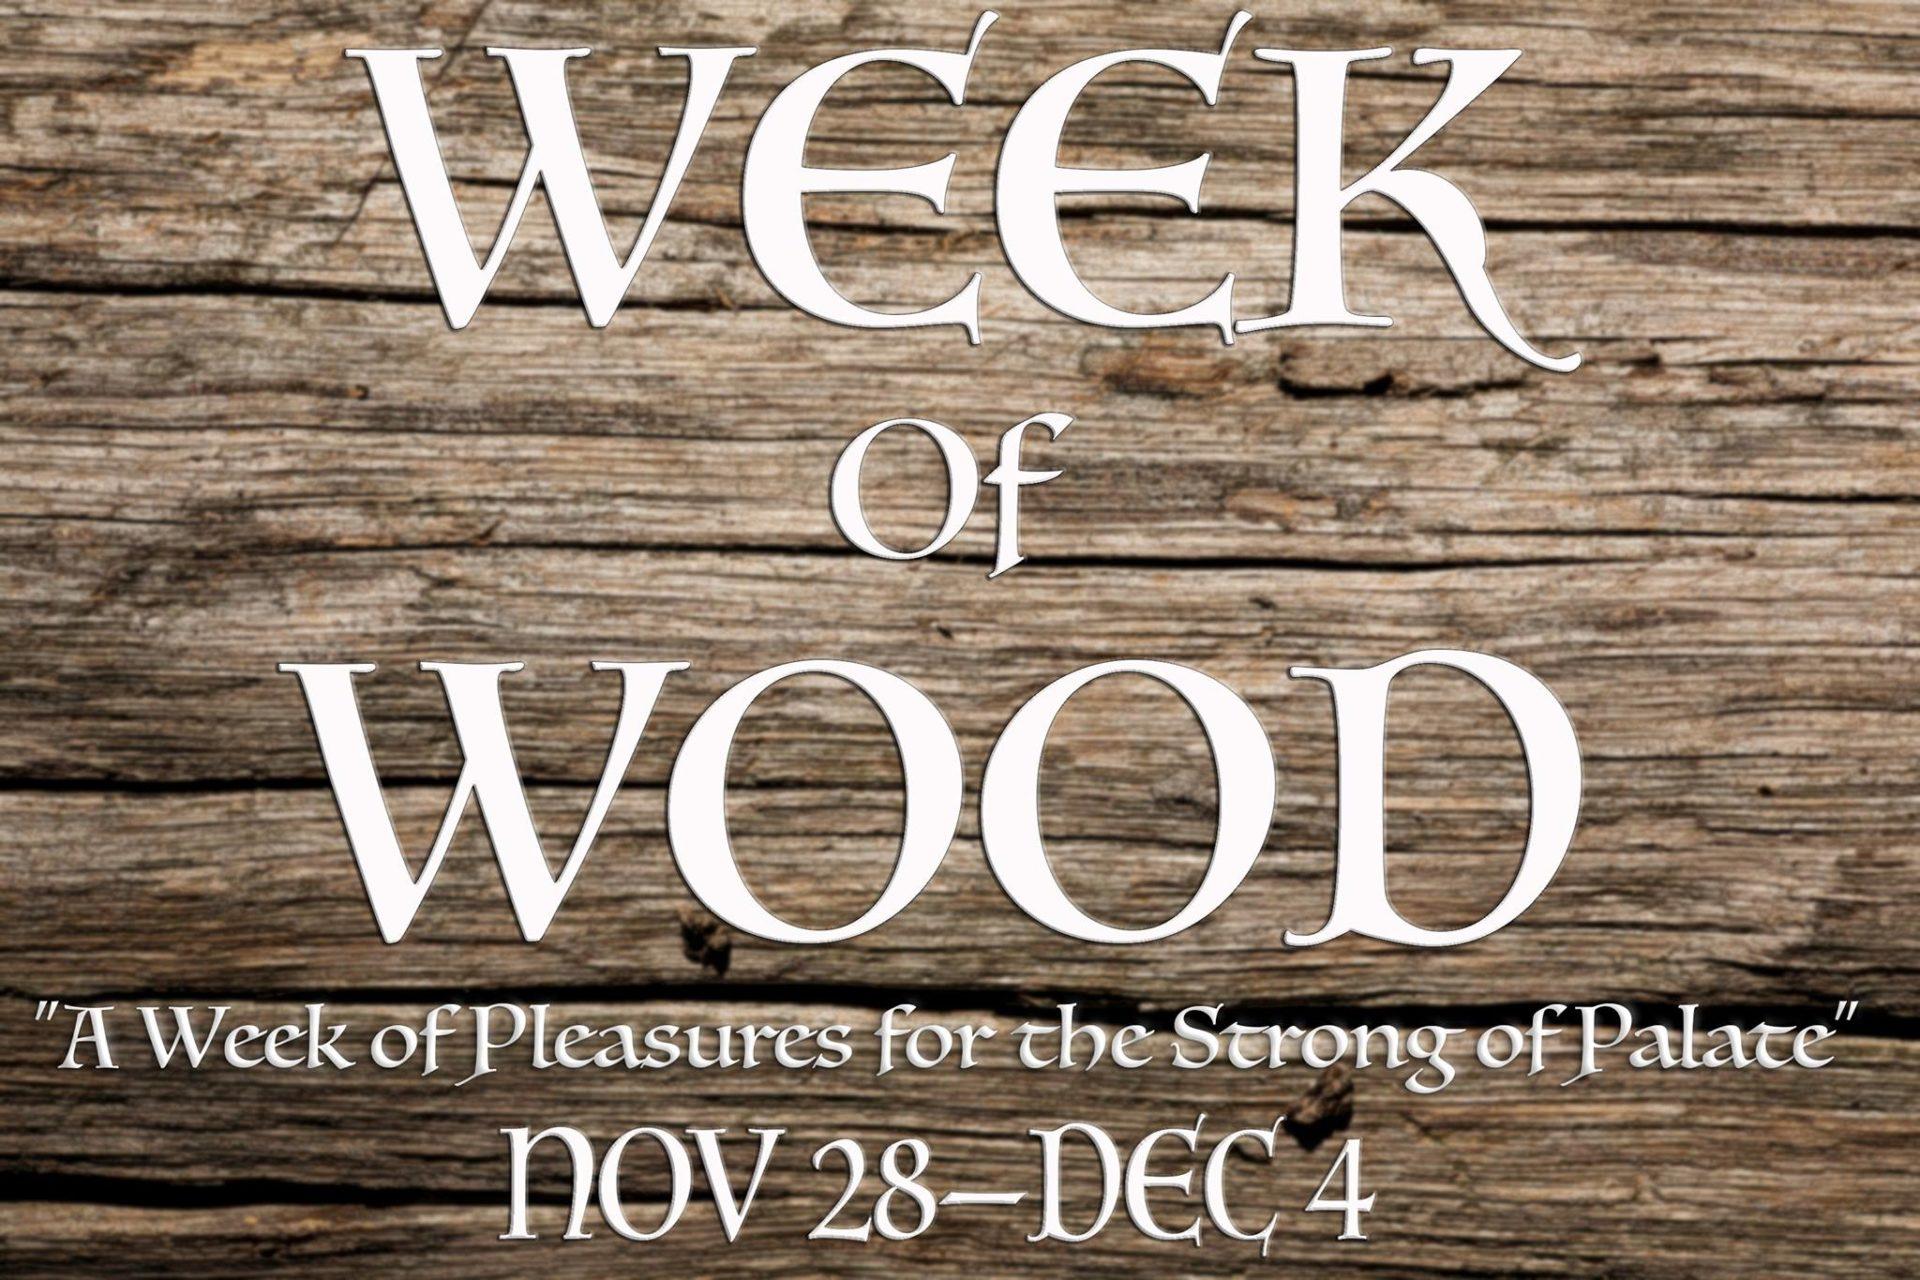 week-of-wood Austin Craft Beer Events Nov 28th to Dec 4th 2016